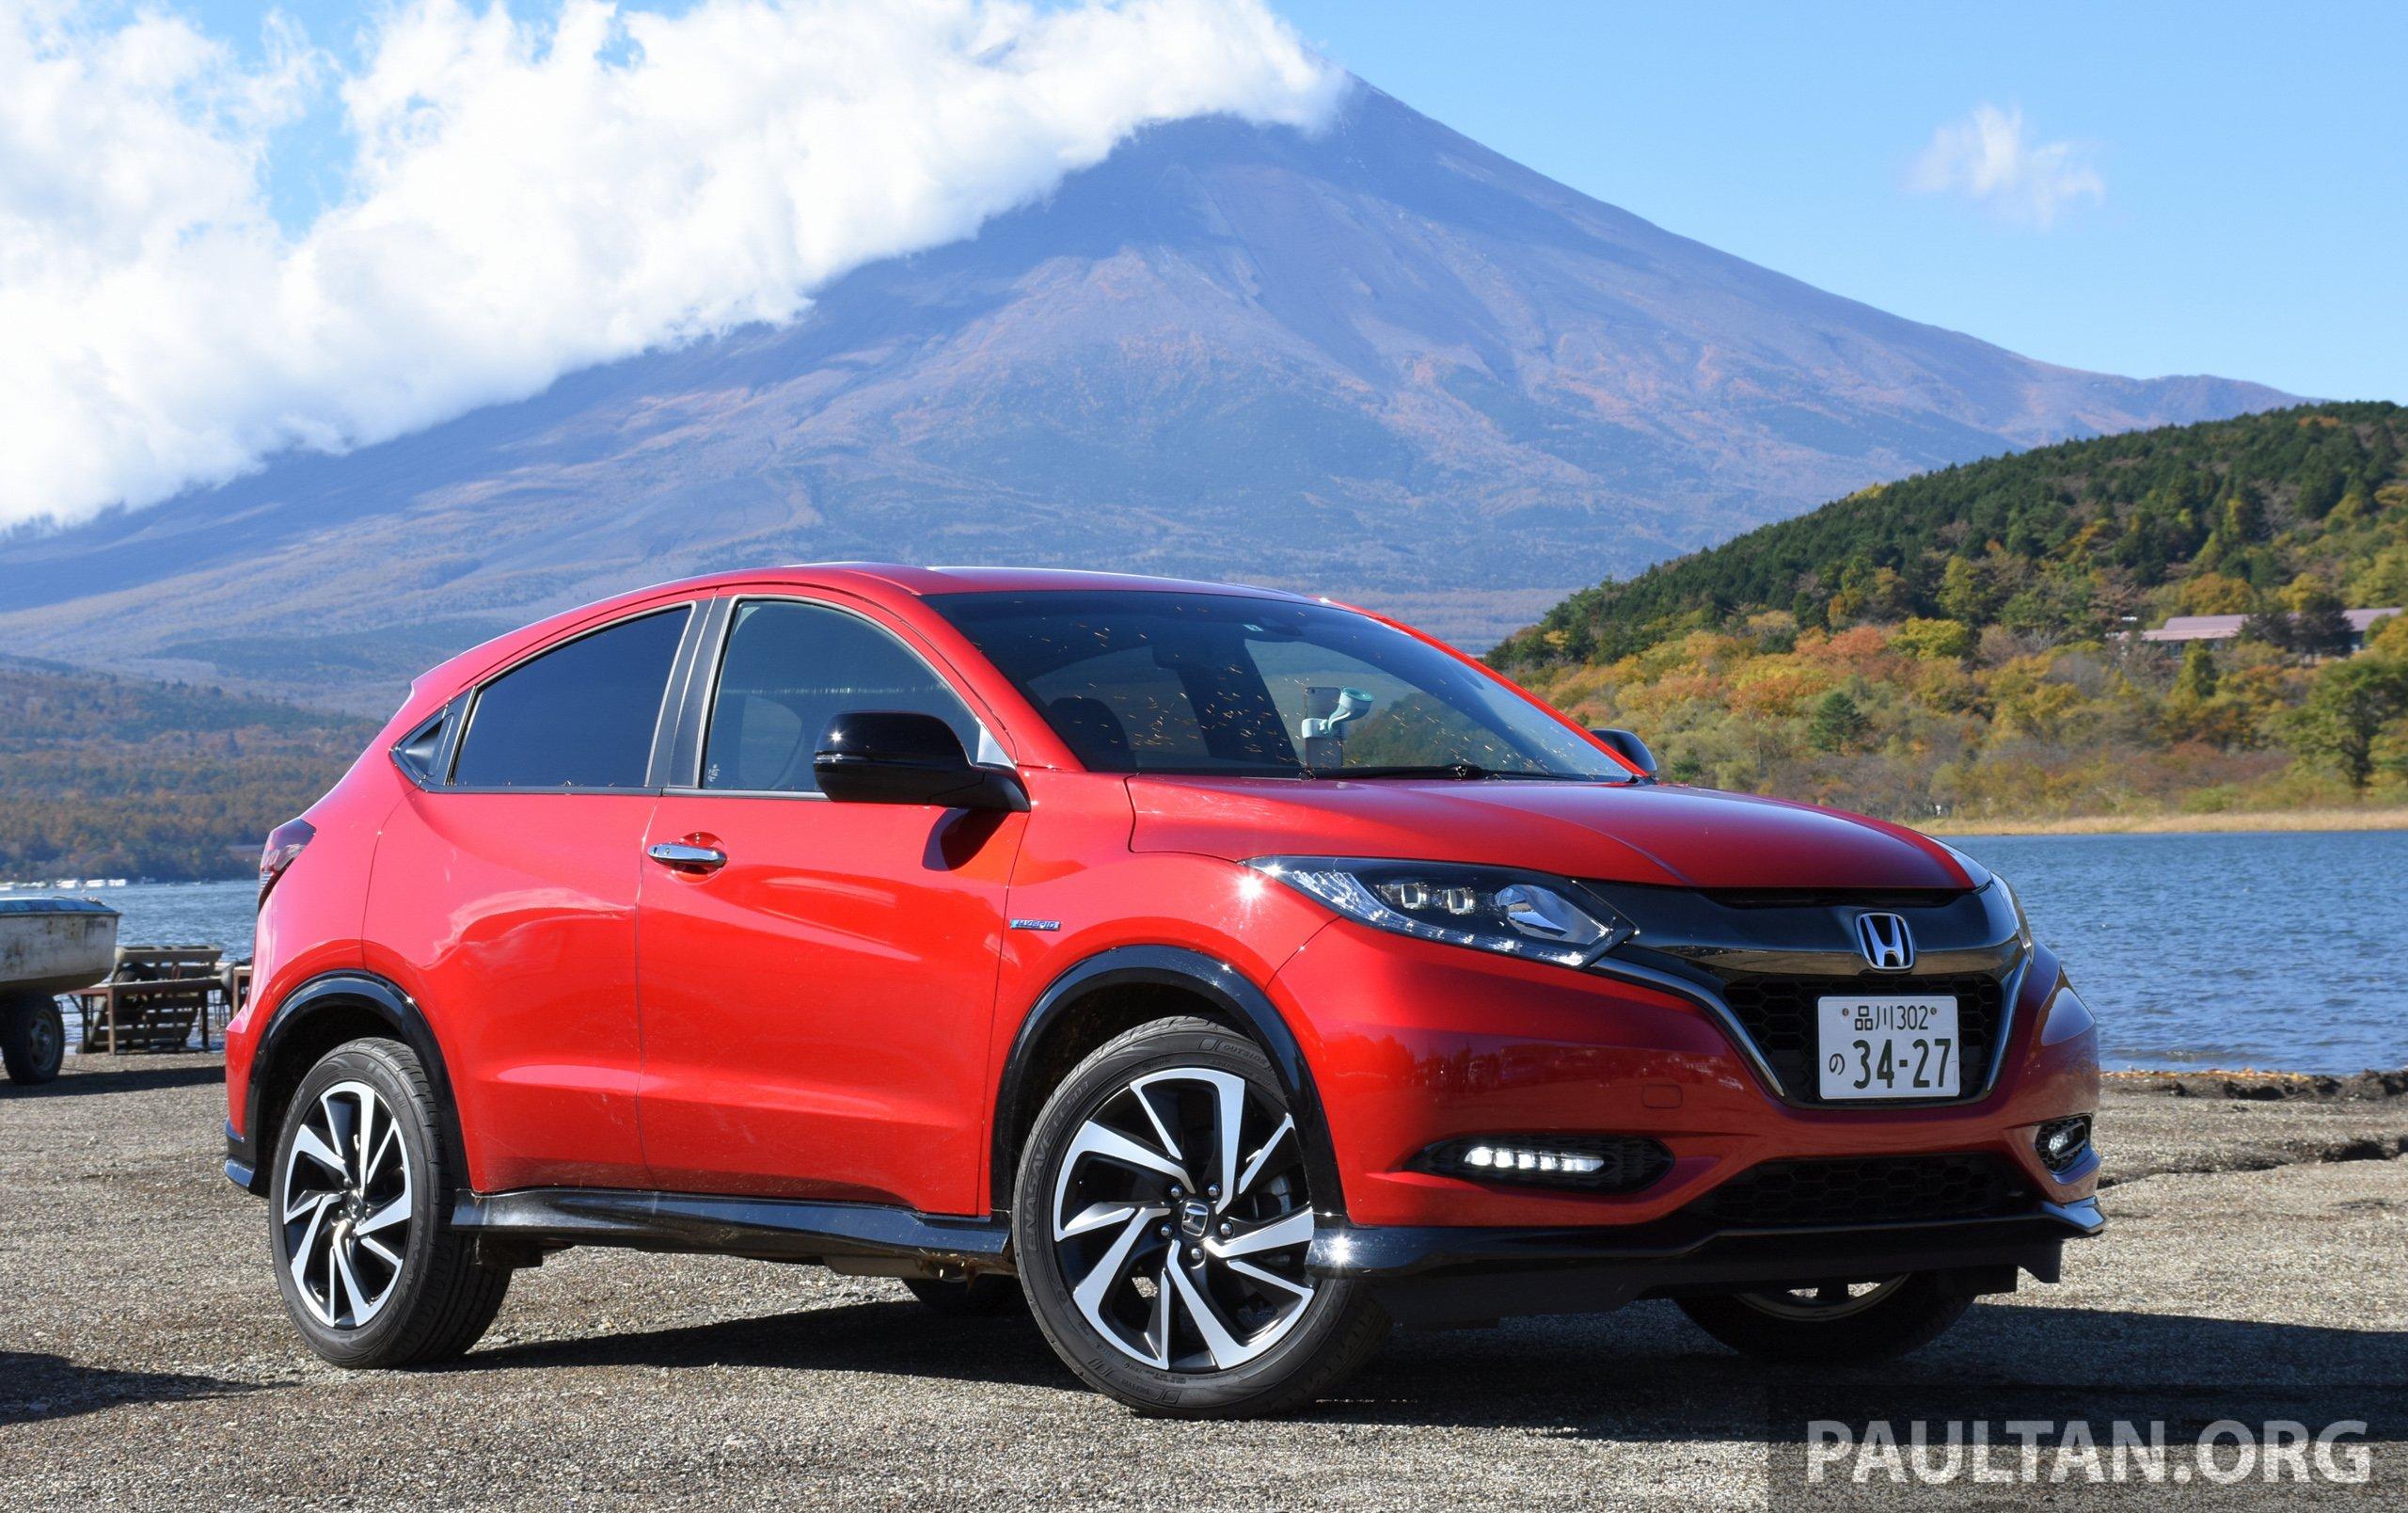 DRIVEN: Honda Sport Hybrid i-DCD models in Japan - a ...